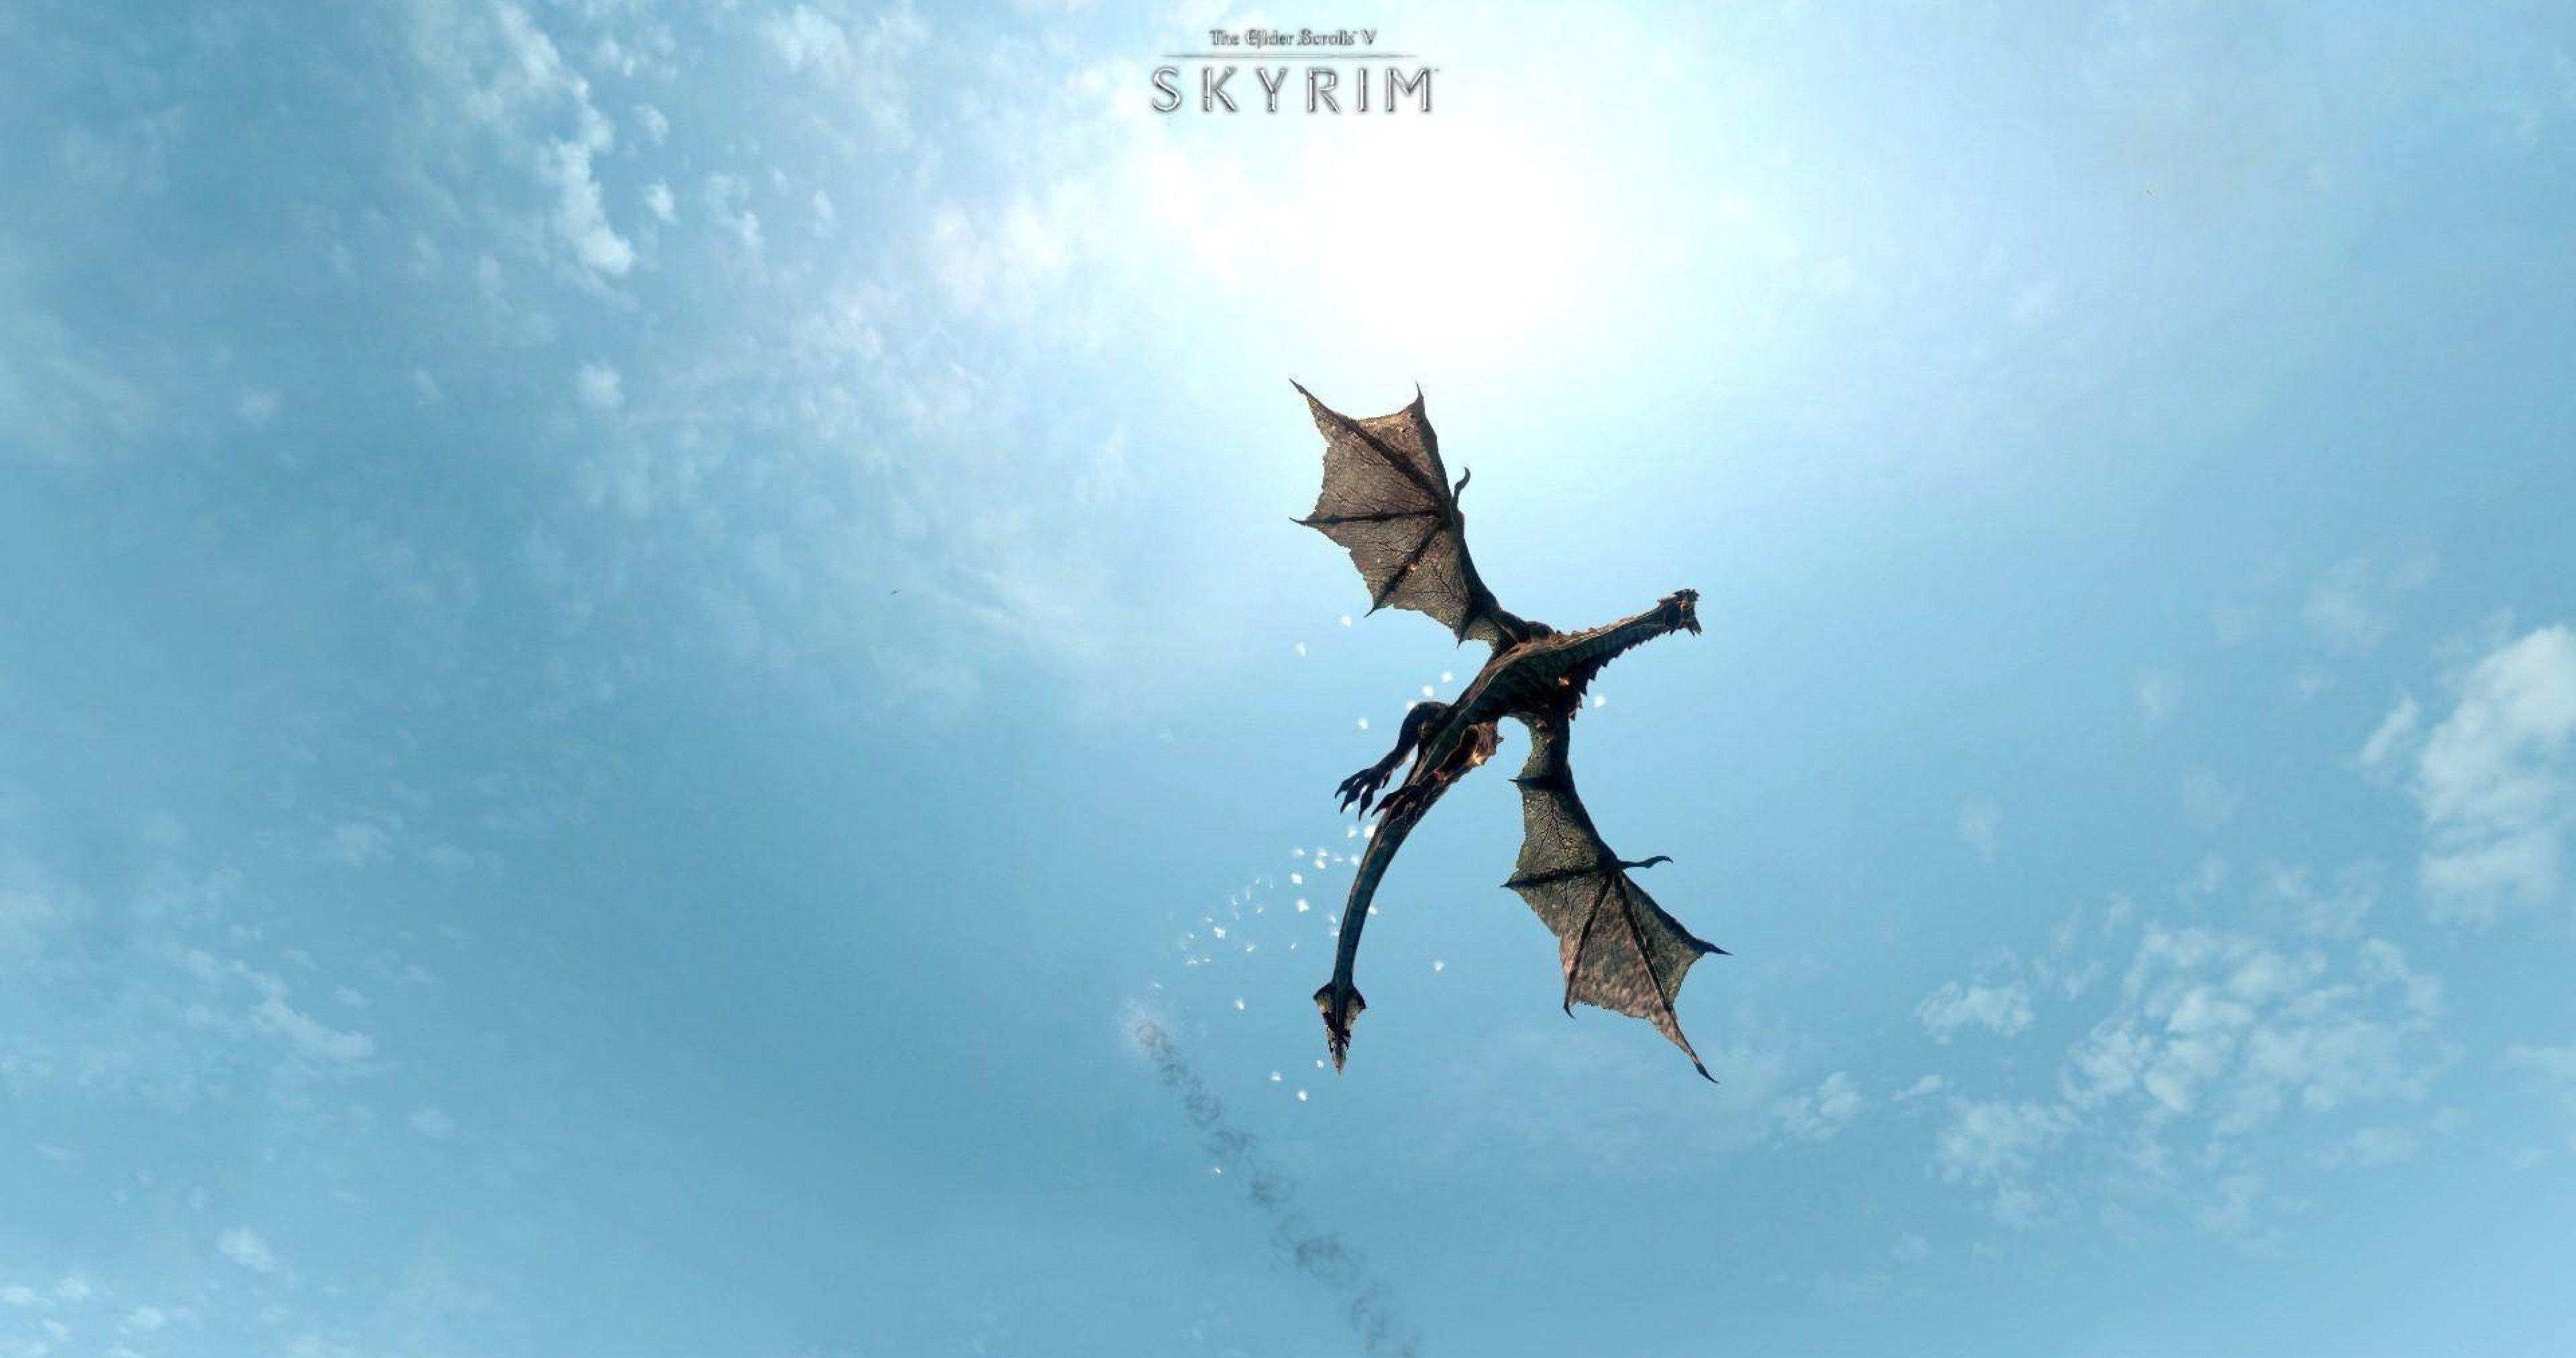 The Elder Scrolls V Skyrim 4k Ultra Hd Wallpaper Ololoshenka